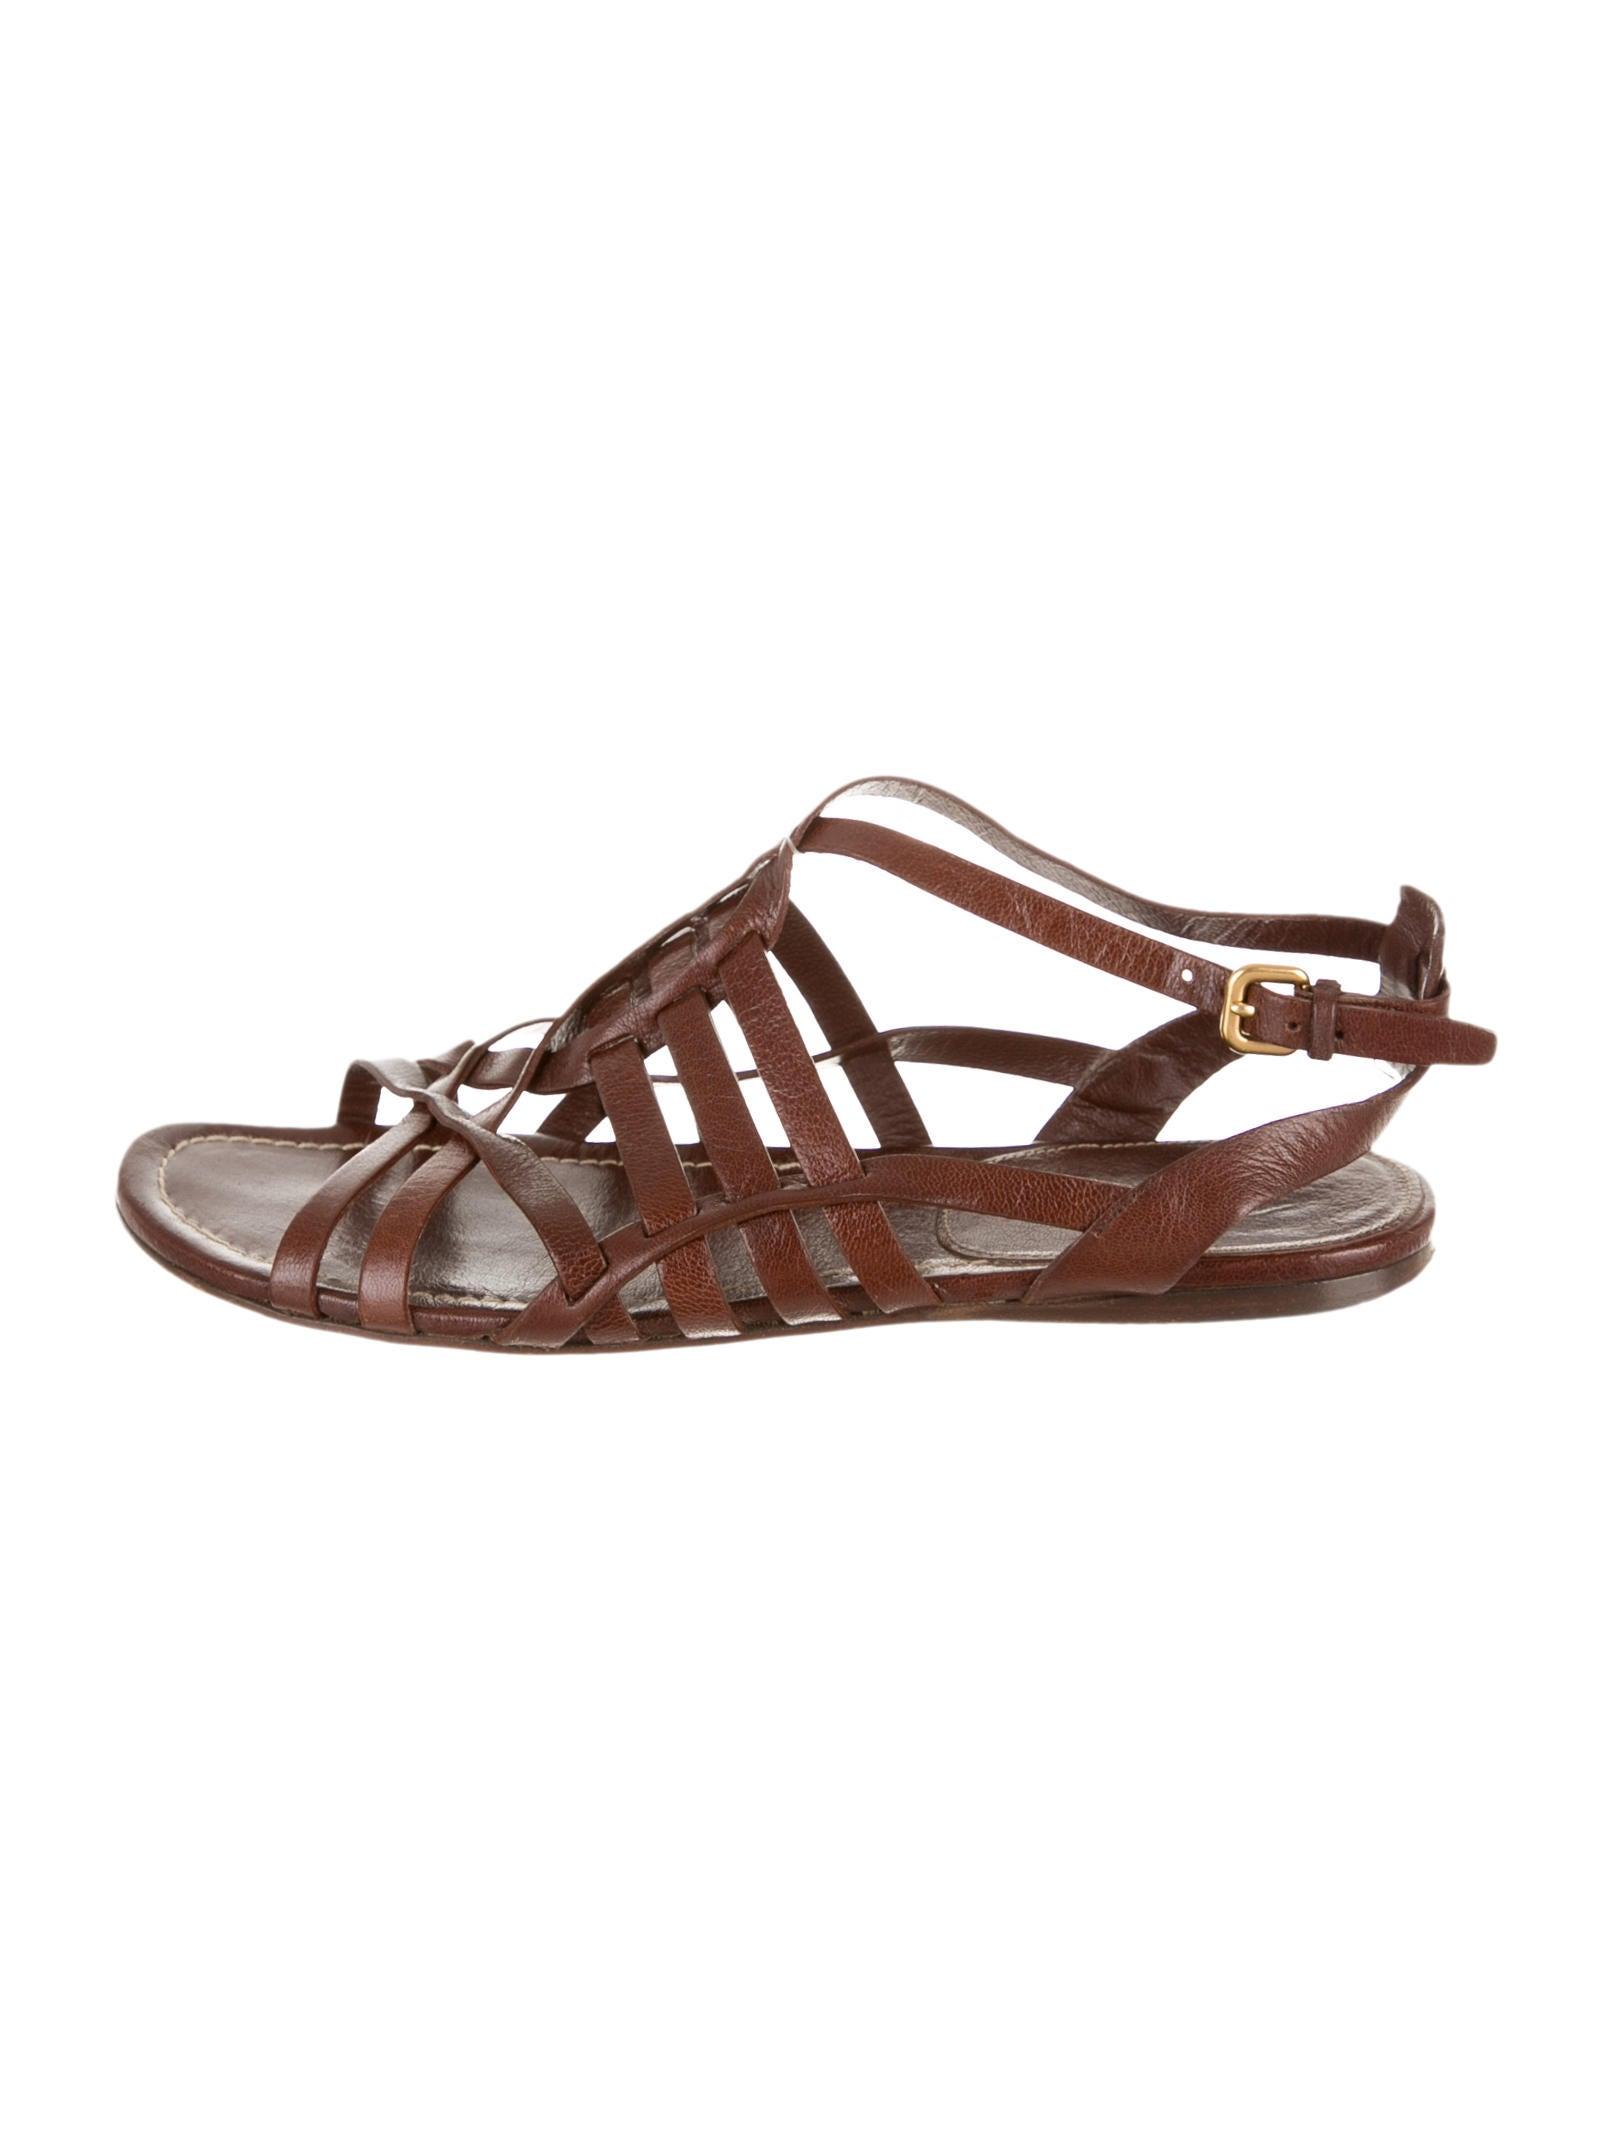 Creative Prada Women 11 Cm Heel Leather Sandal Shoes  Spence Outlet